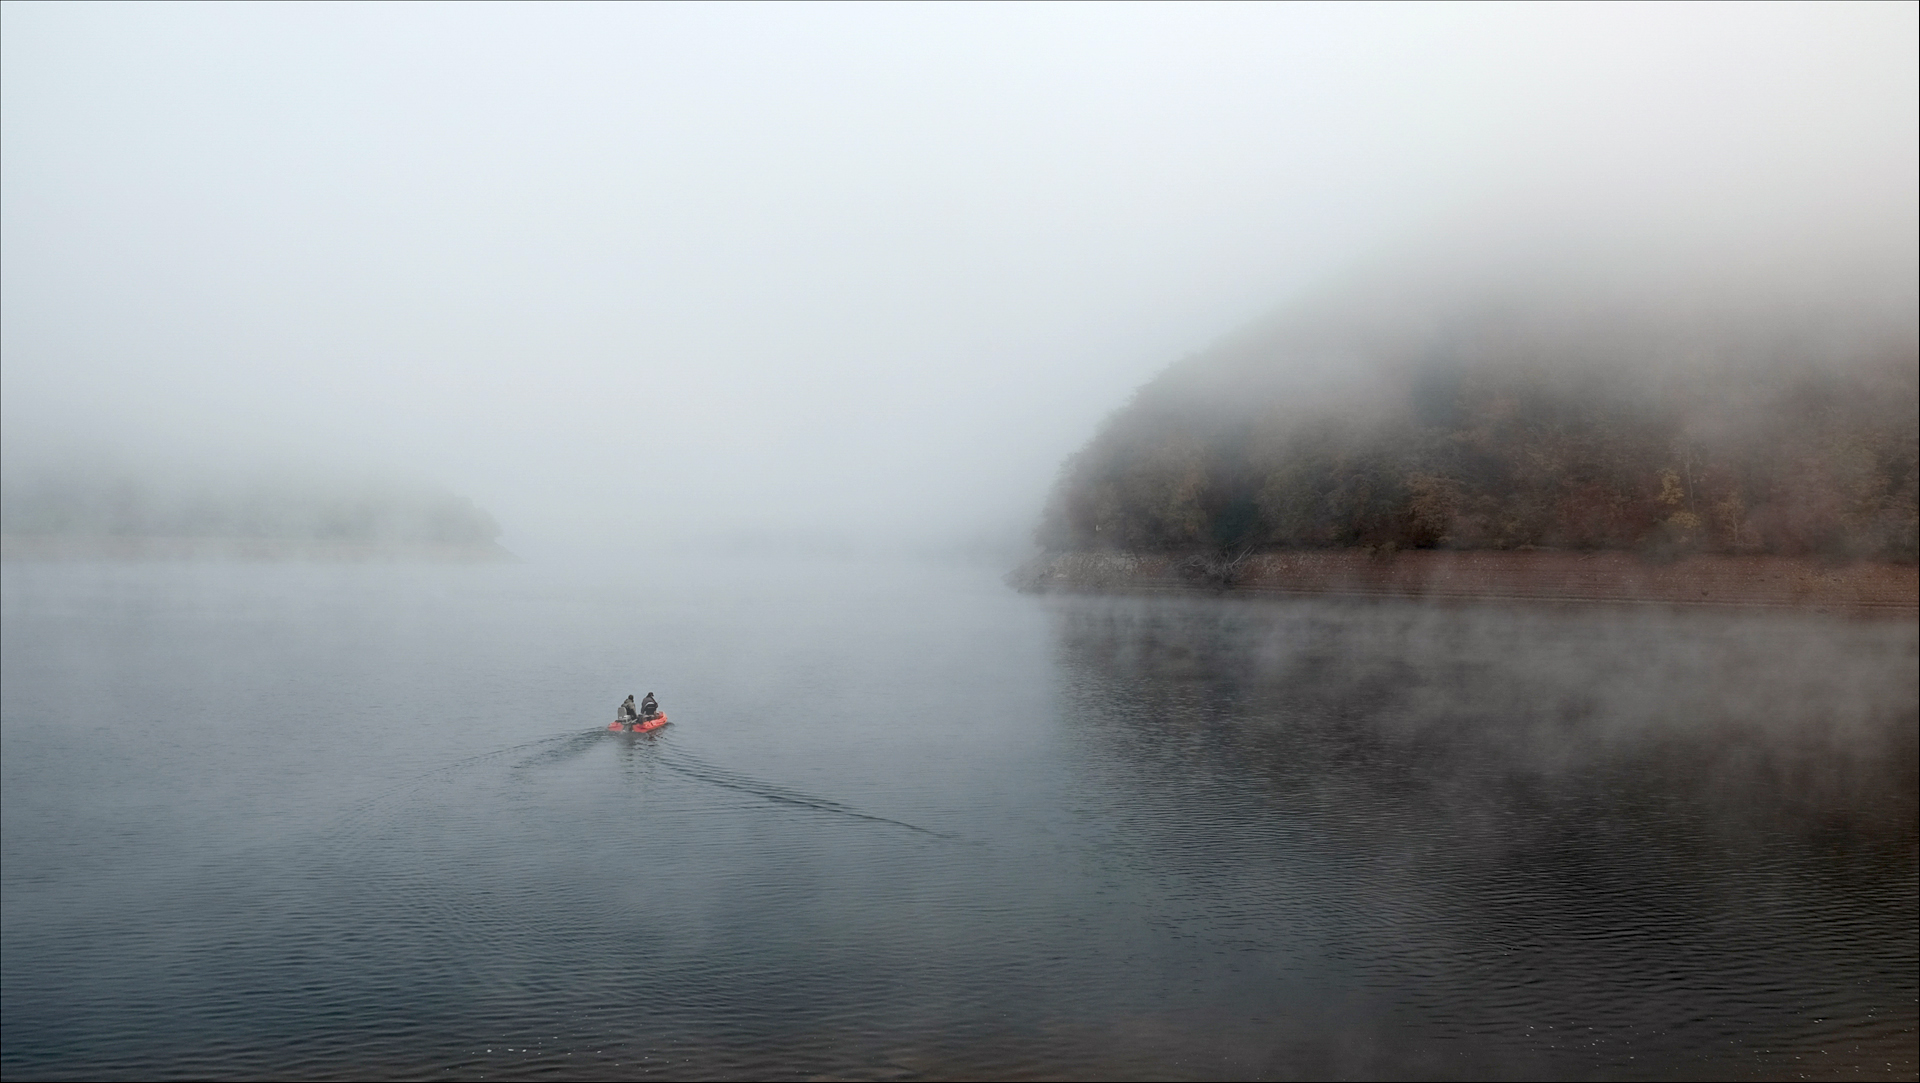 Pêche en hiver   Photo: Ph Leblond